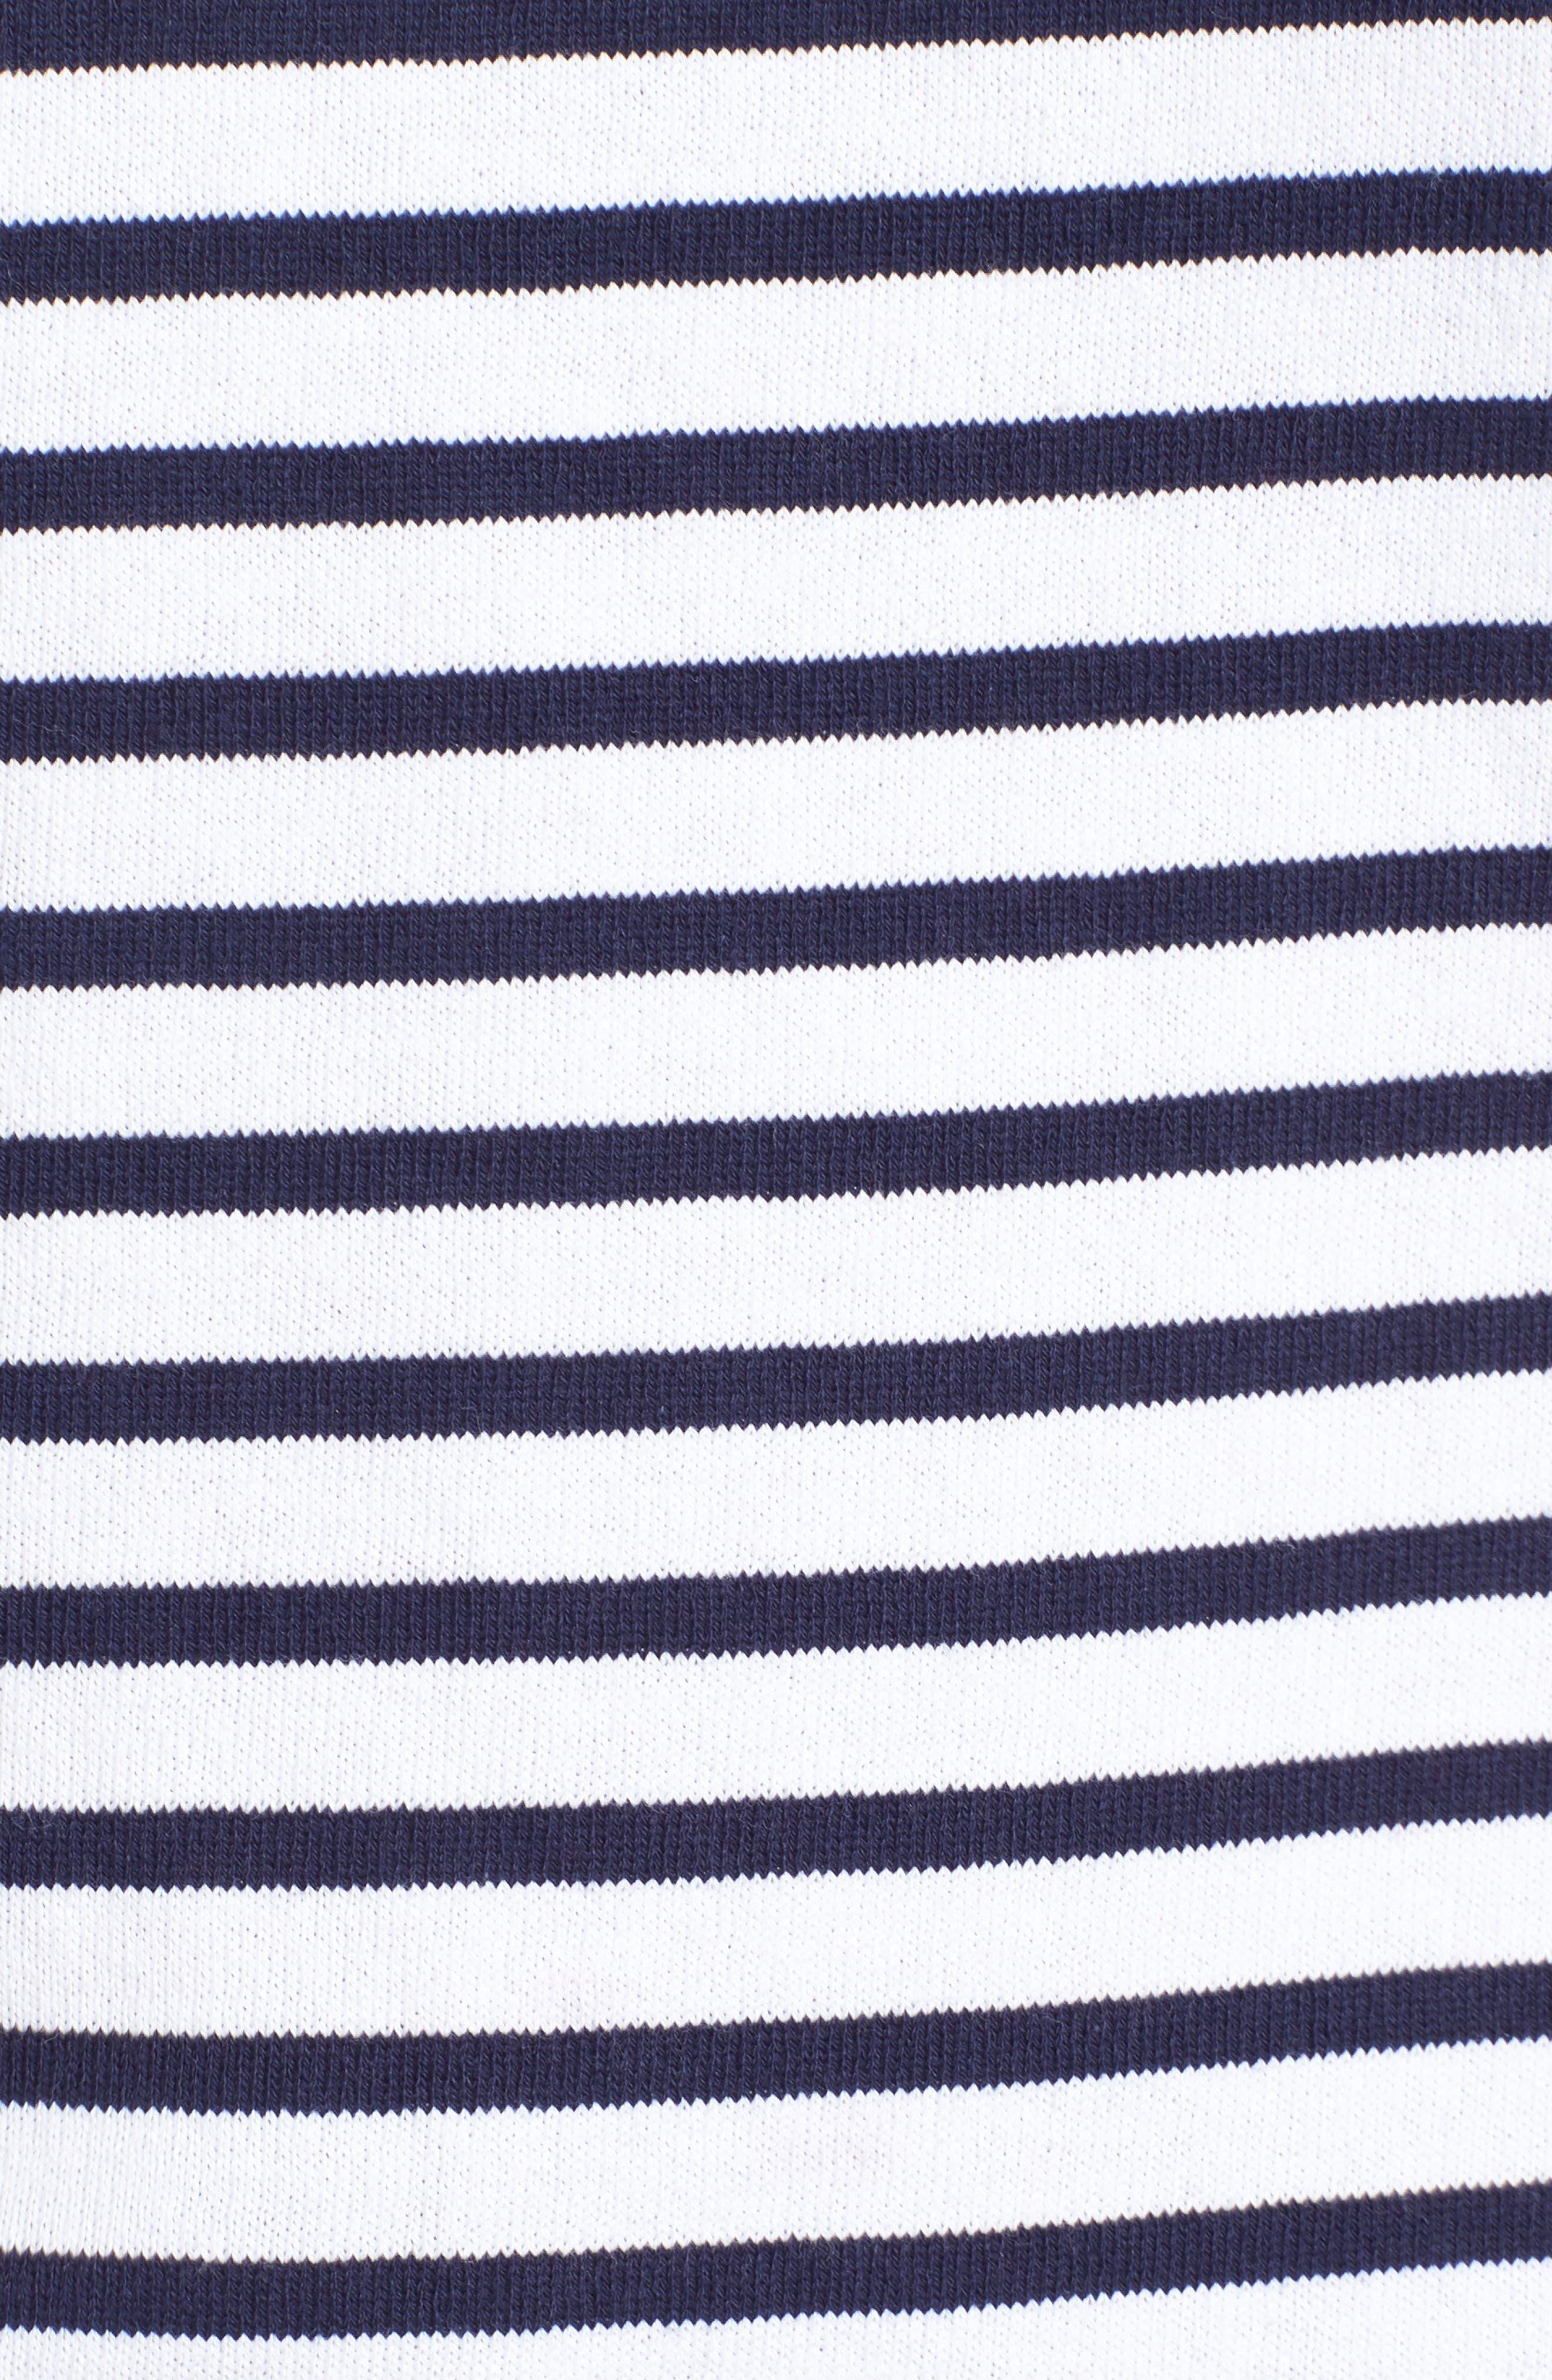 Grosgrain Swing Top,                             Alternate thumbnail 5, color,                             100